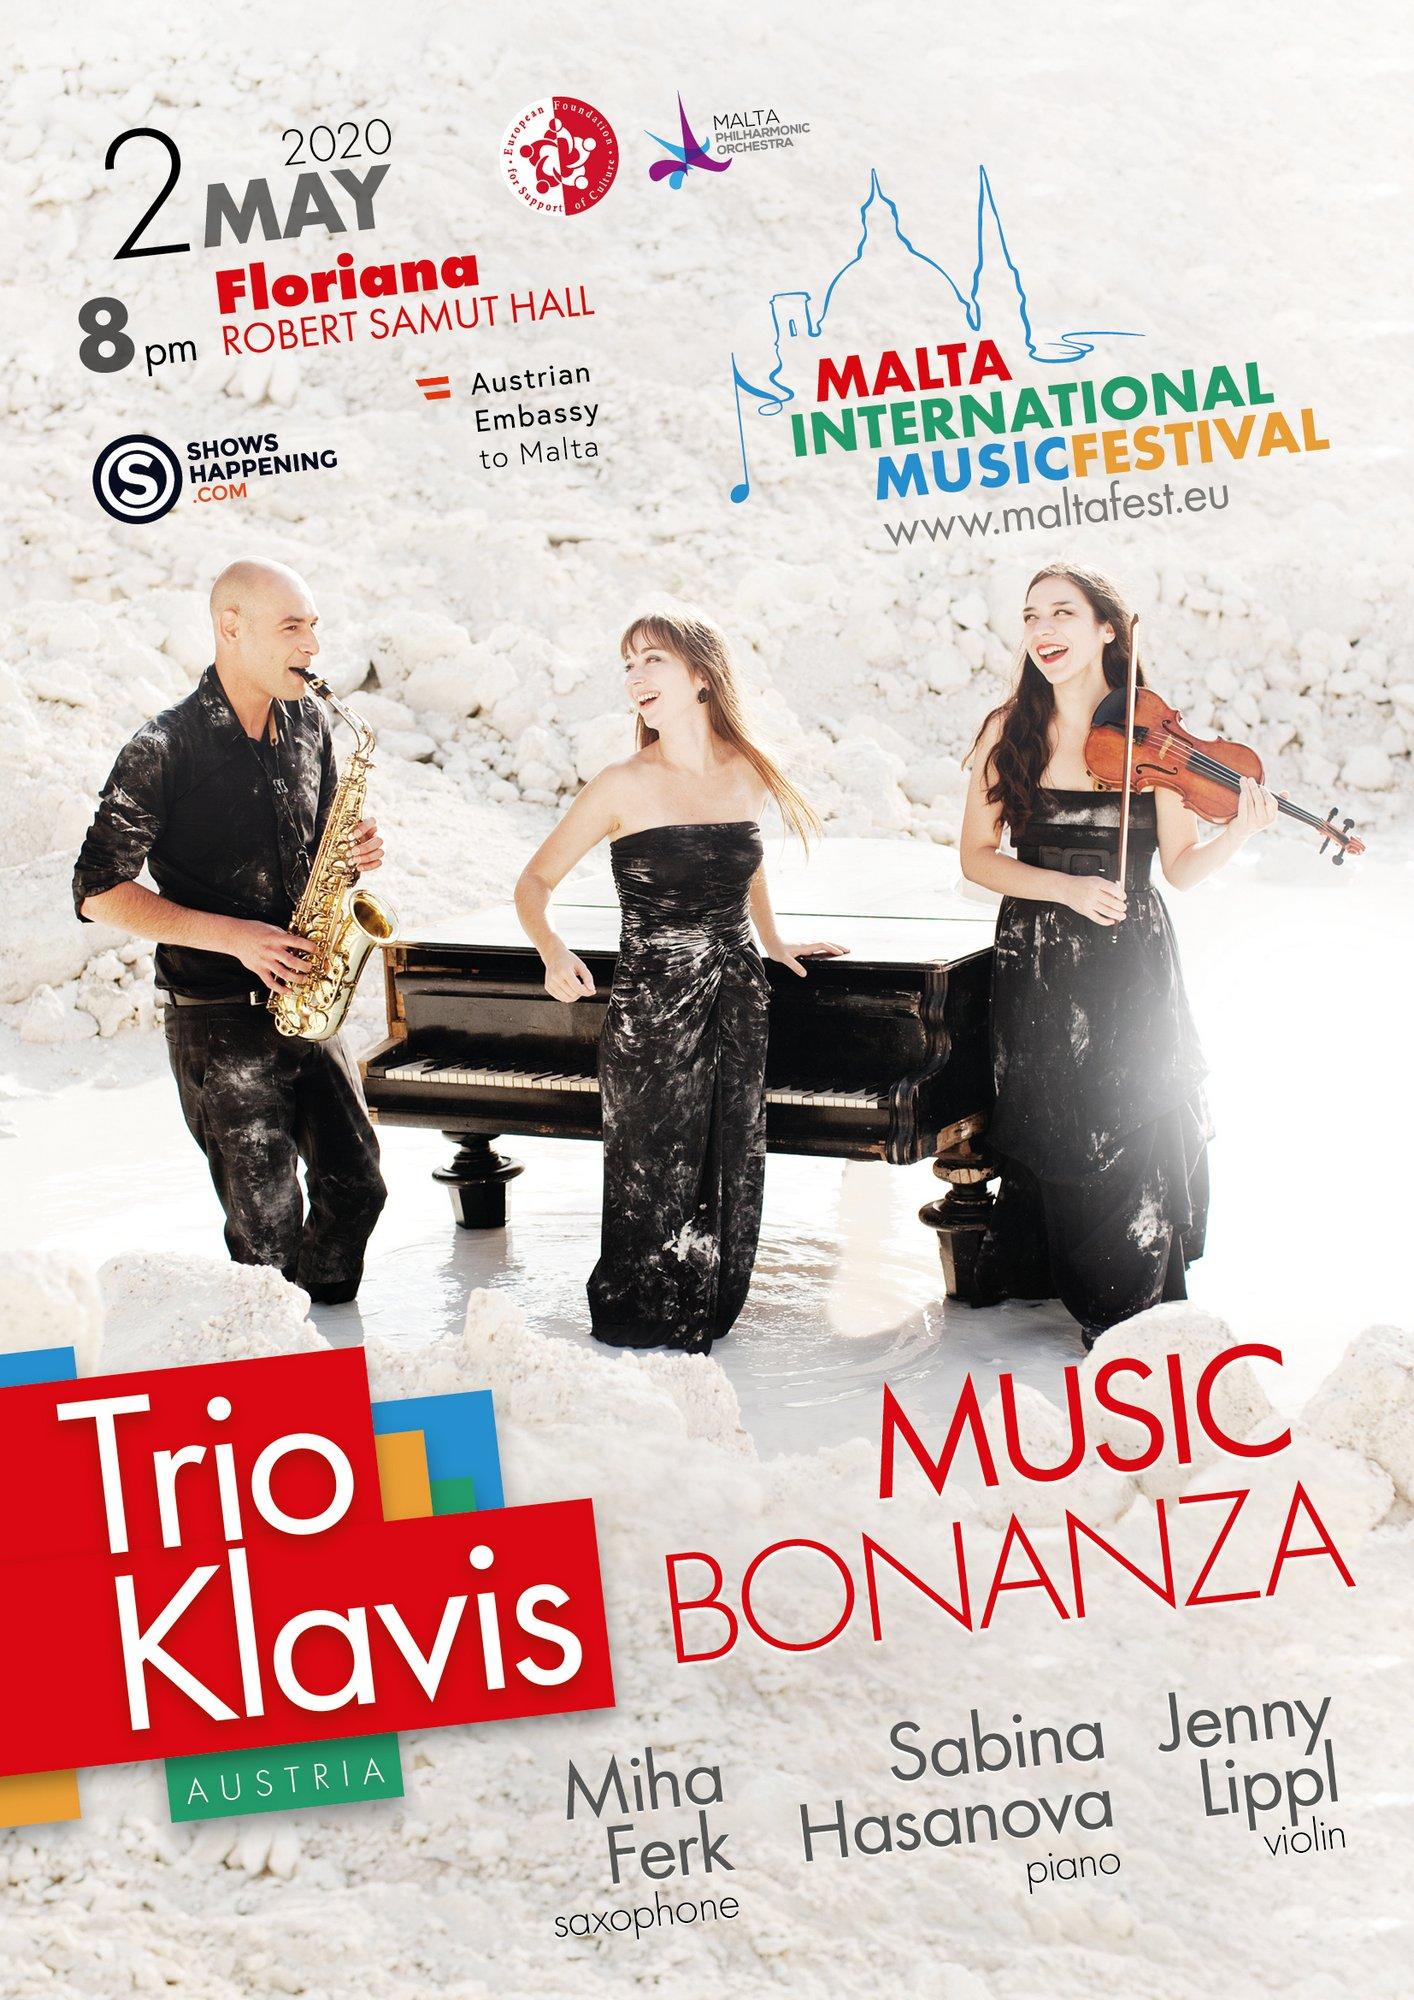 MUSIC BONANZA flyer